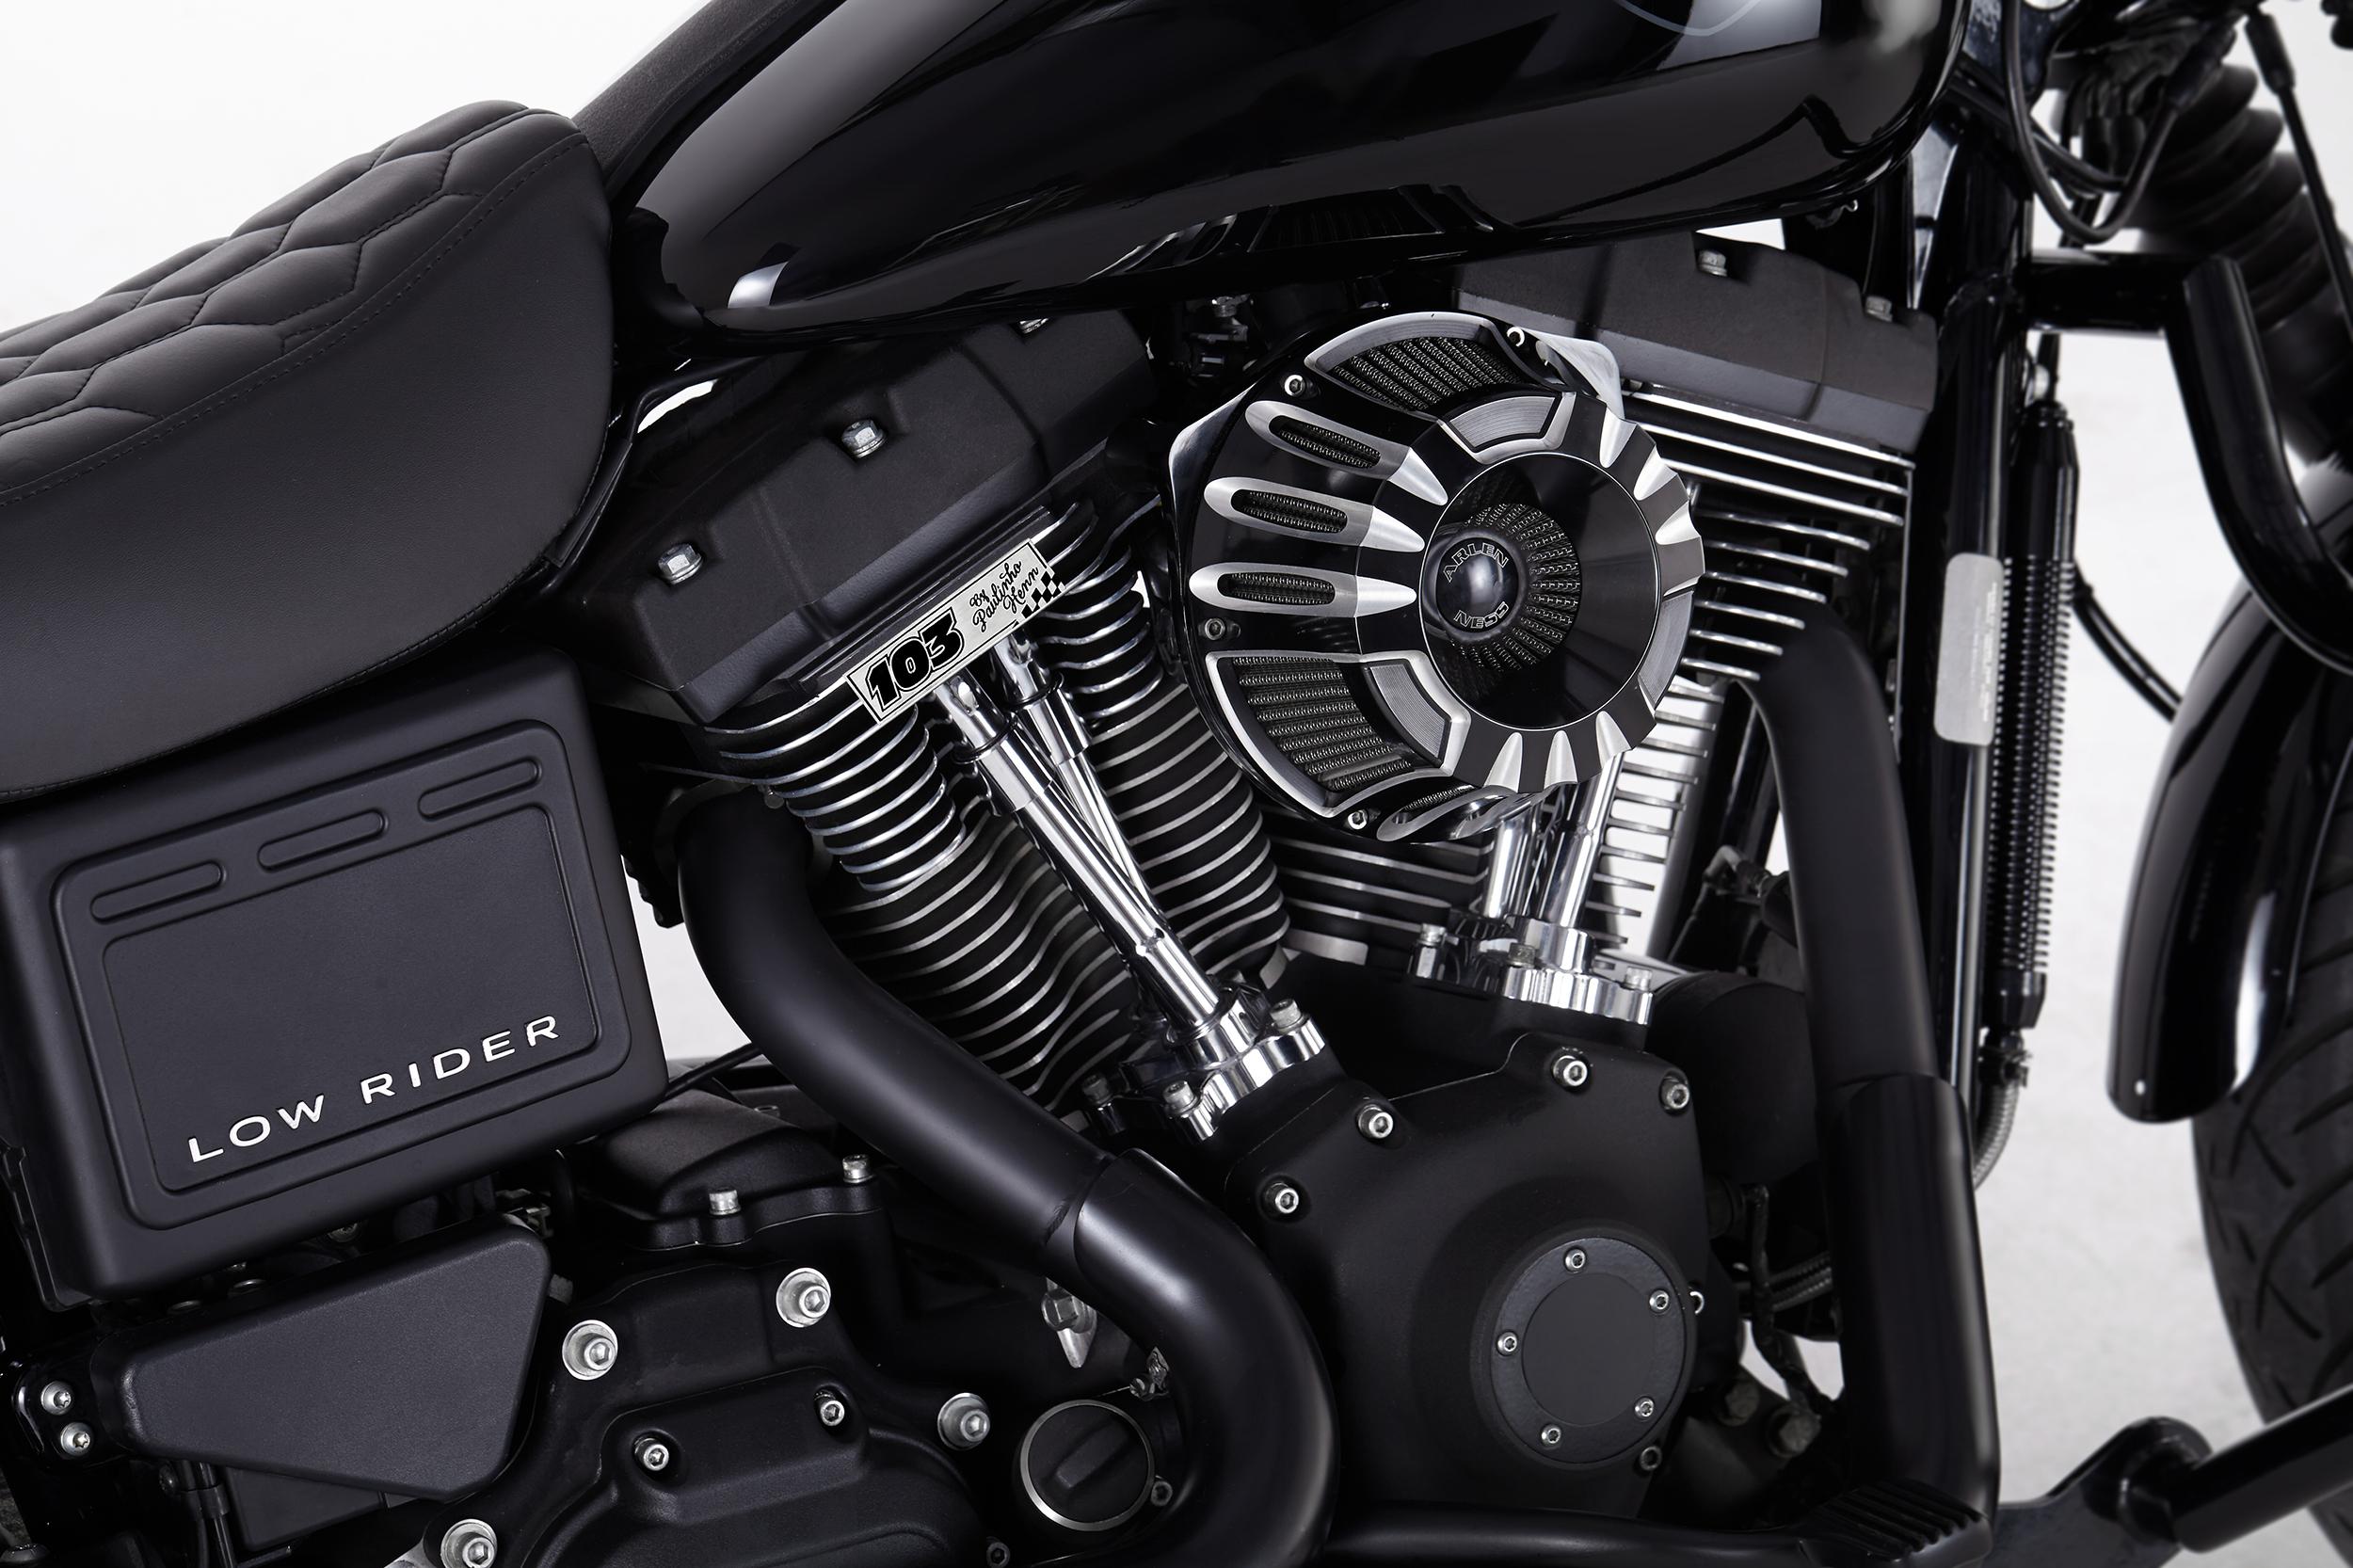 Dyna Low Rider Club Style com upgrade monstro de motor